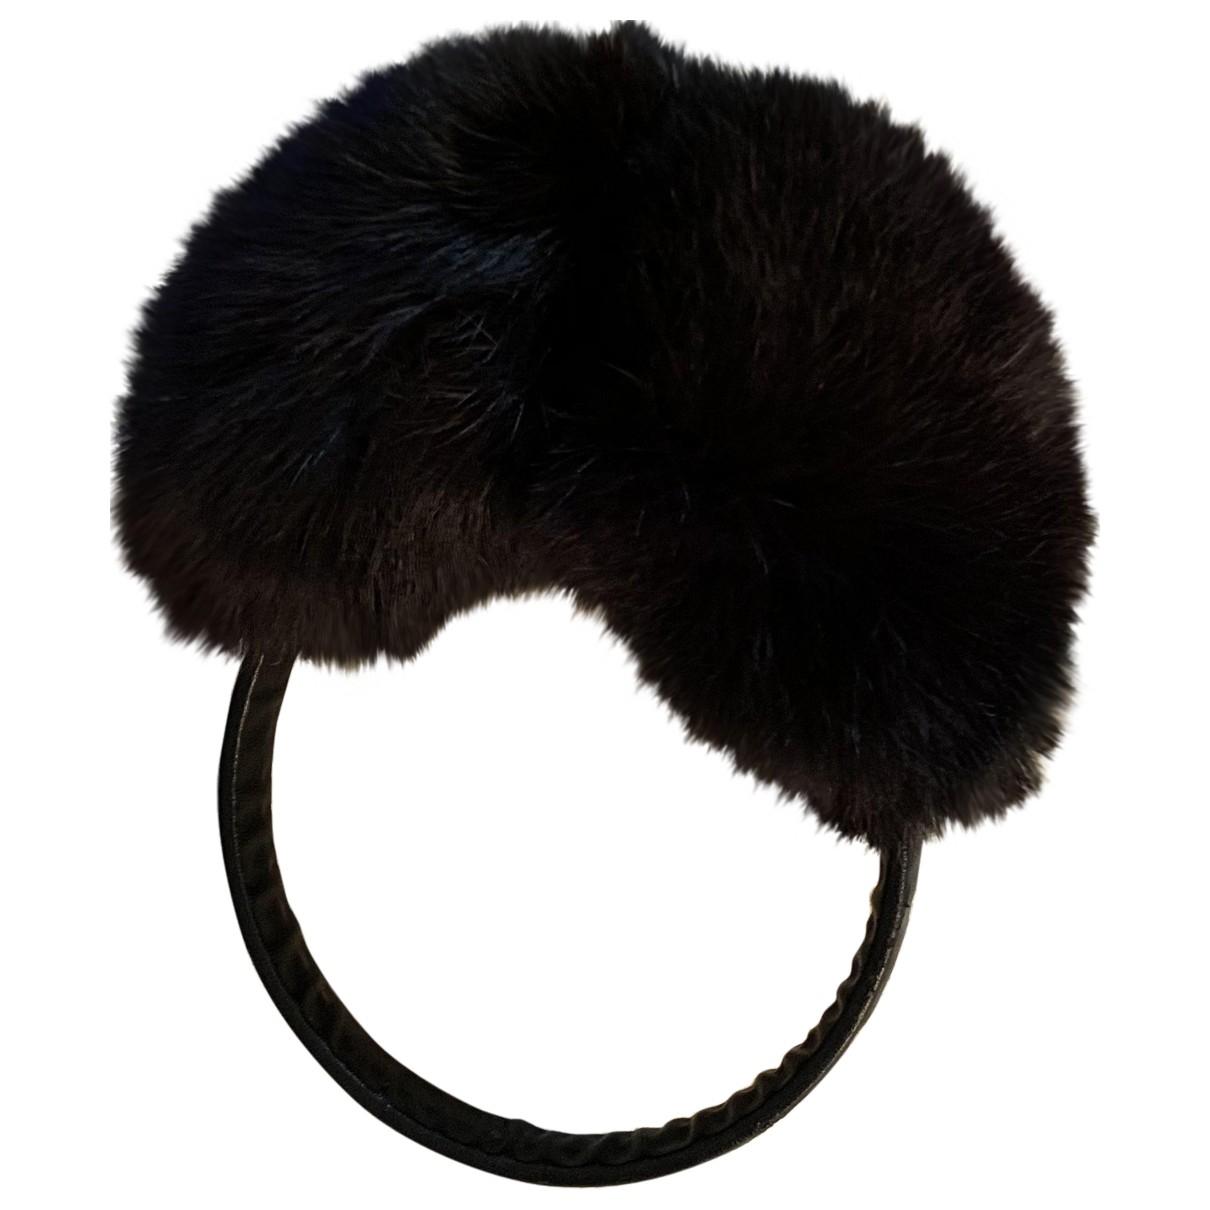 Pellicciai \N Black Rabbit hat for Women S International